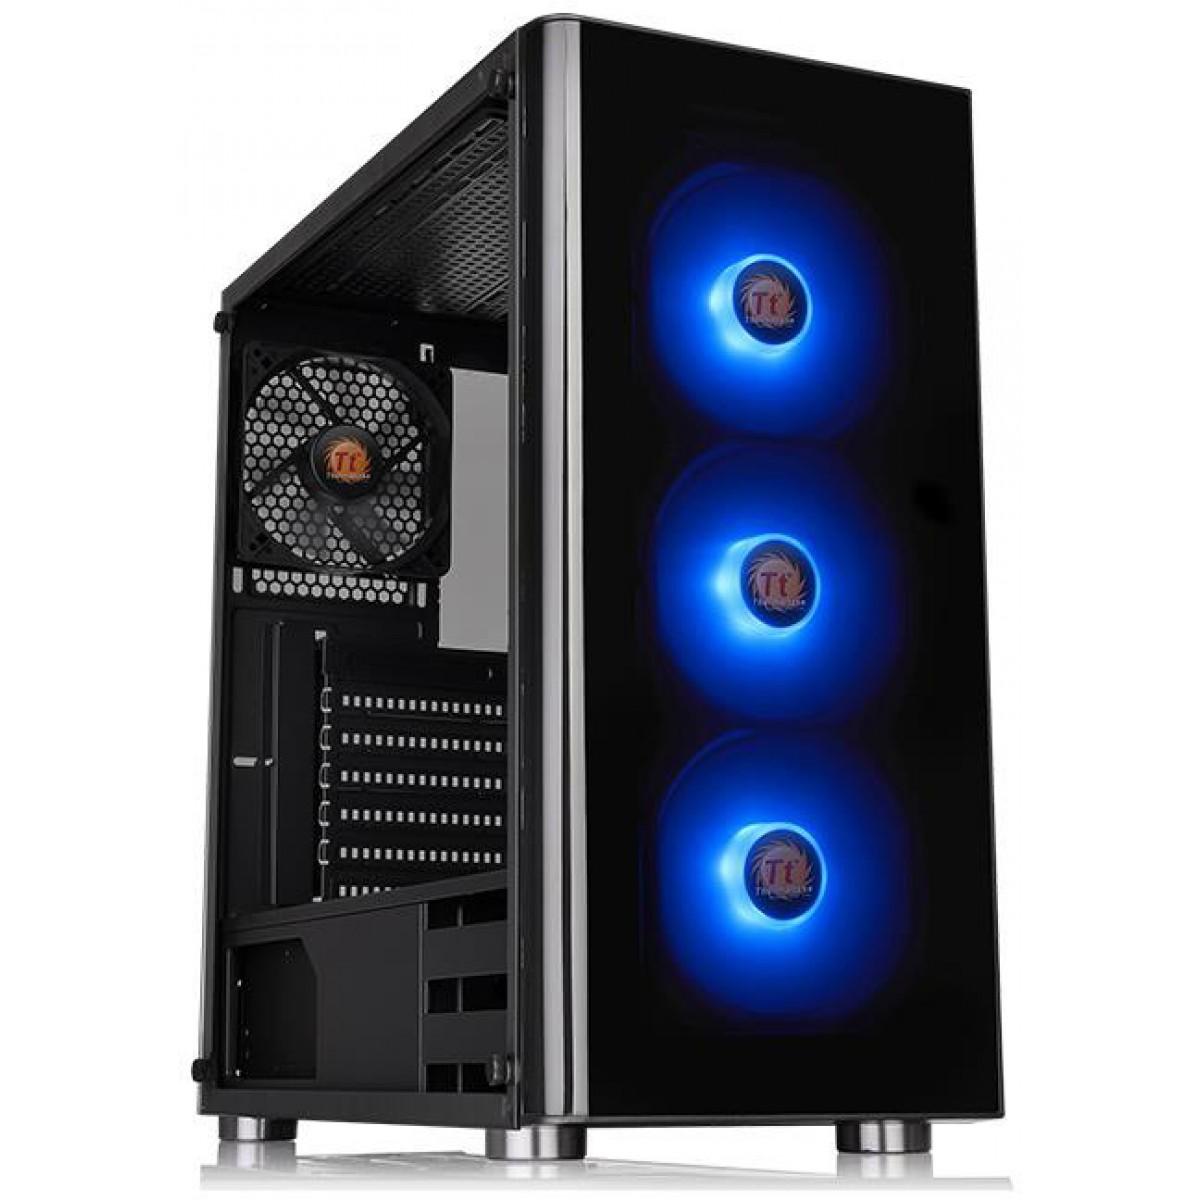 Gabinete Gamer Thermaltake V200, Mid Tower, Sem Fan, Vidro temperado, Black, Com Fonte 600W, CA-3K8-60M1WZ-01